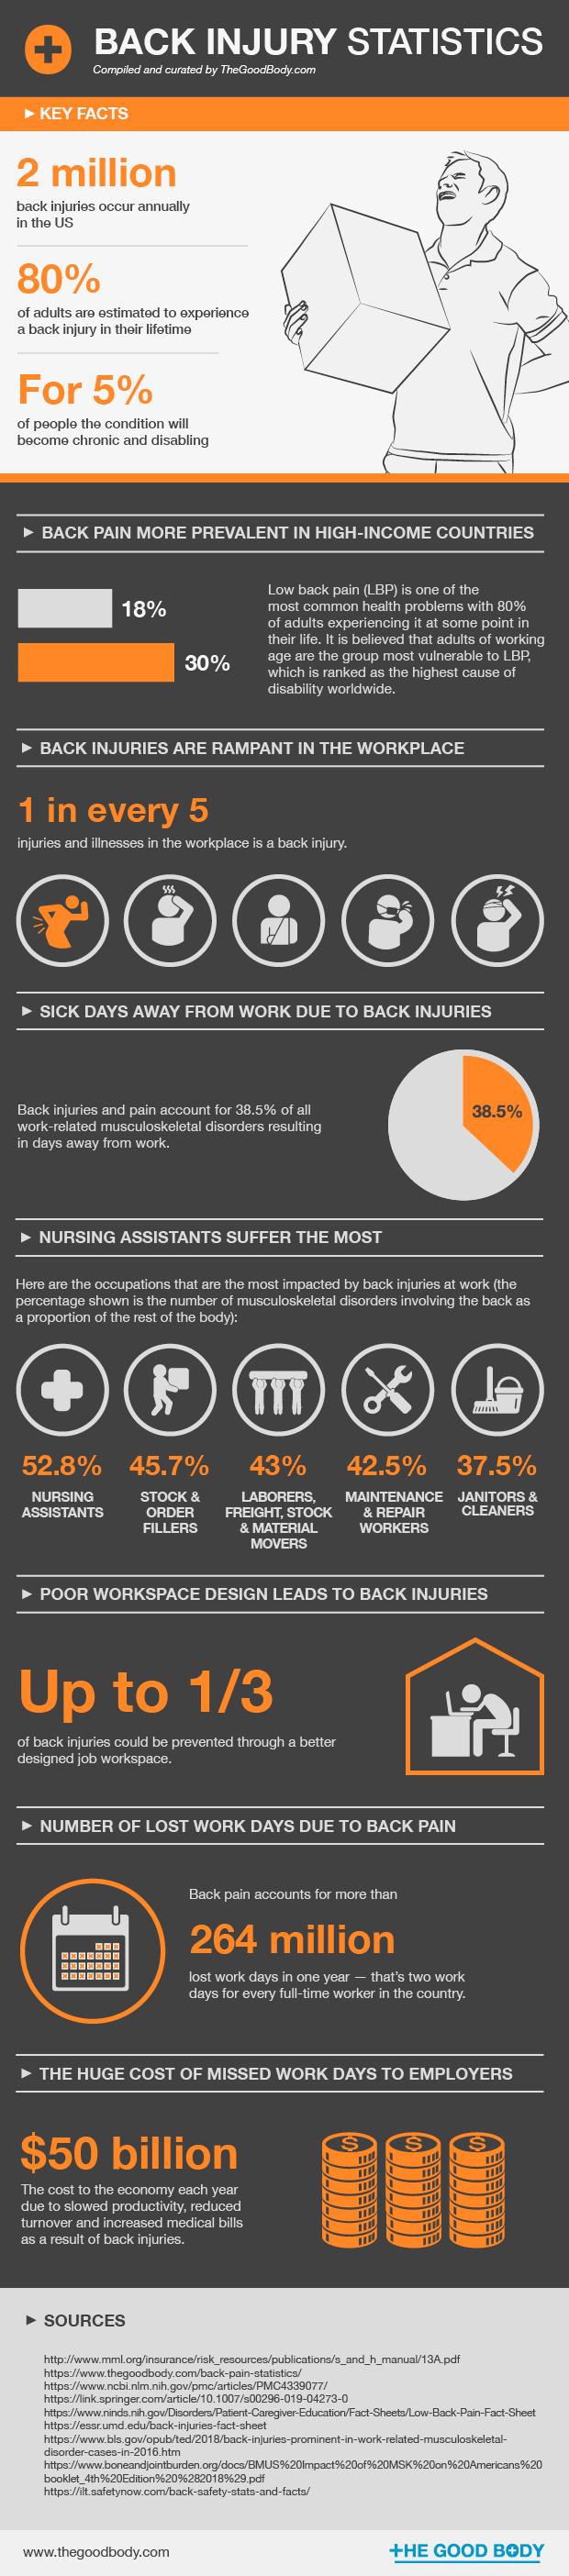 Back injury statistics - infographic